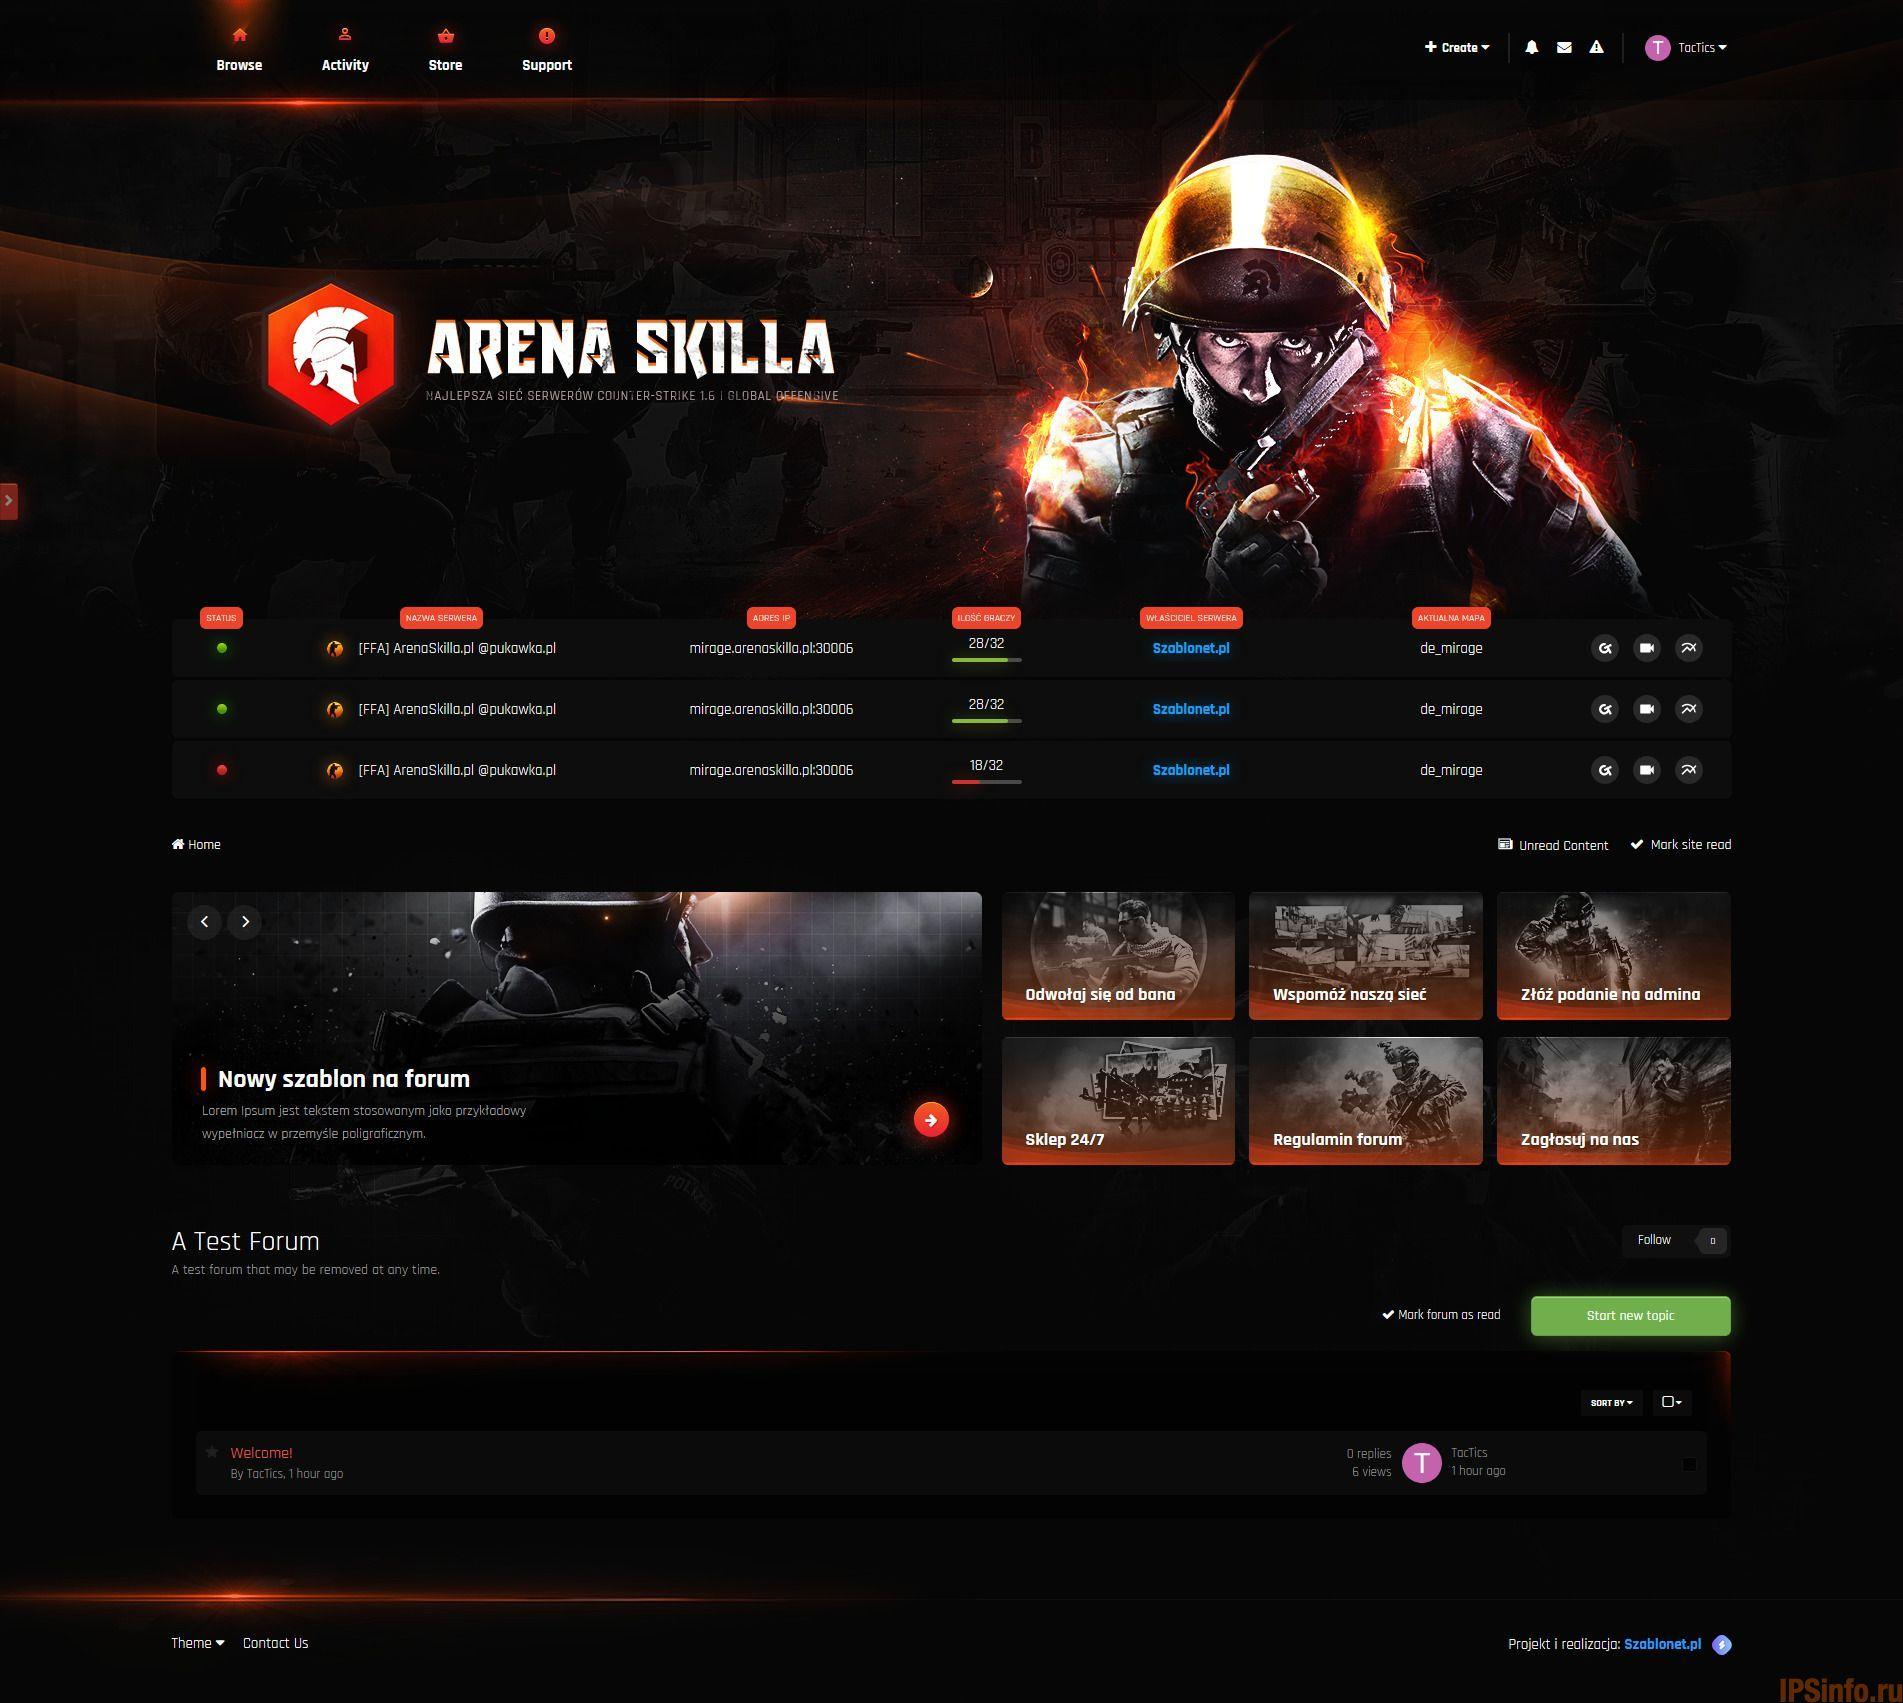 Arena Skilla